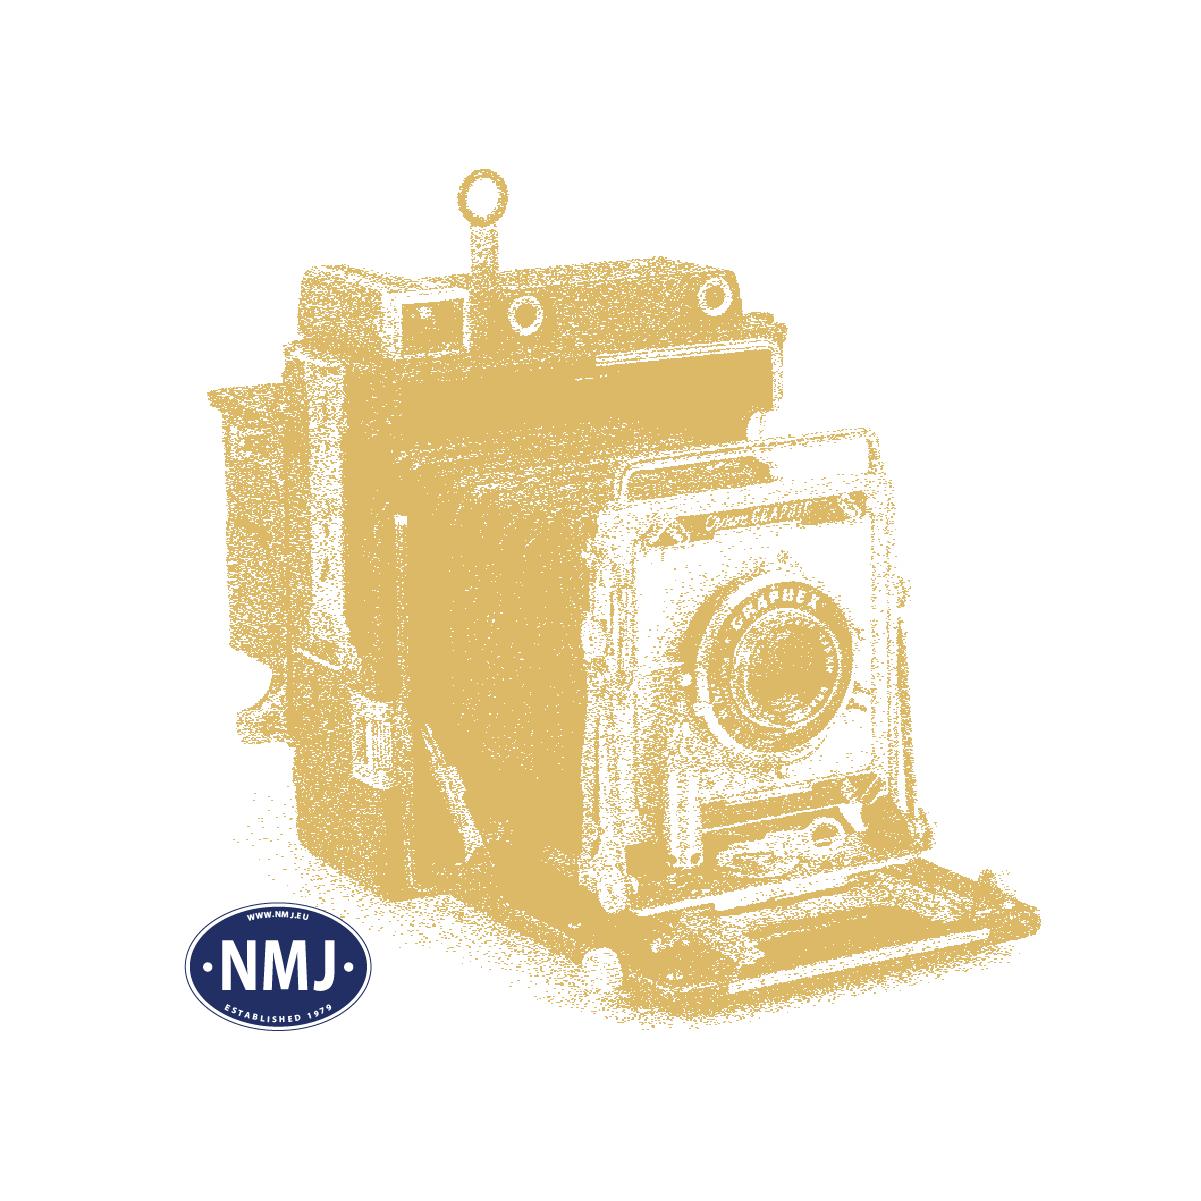 NMJT504.102 - NMJ Topline NSB His 210 2 009-8